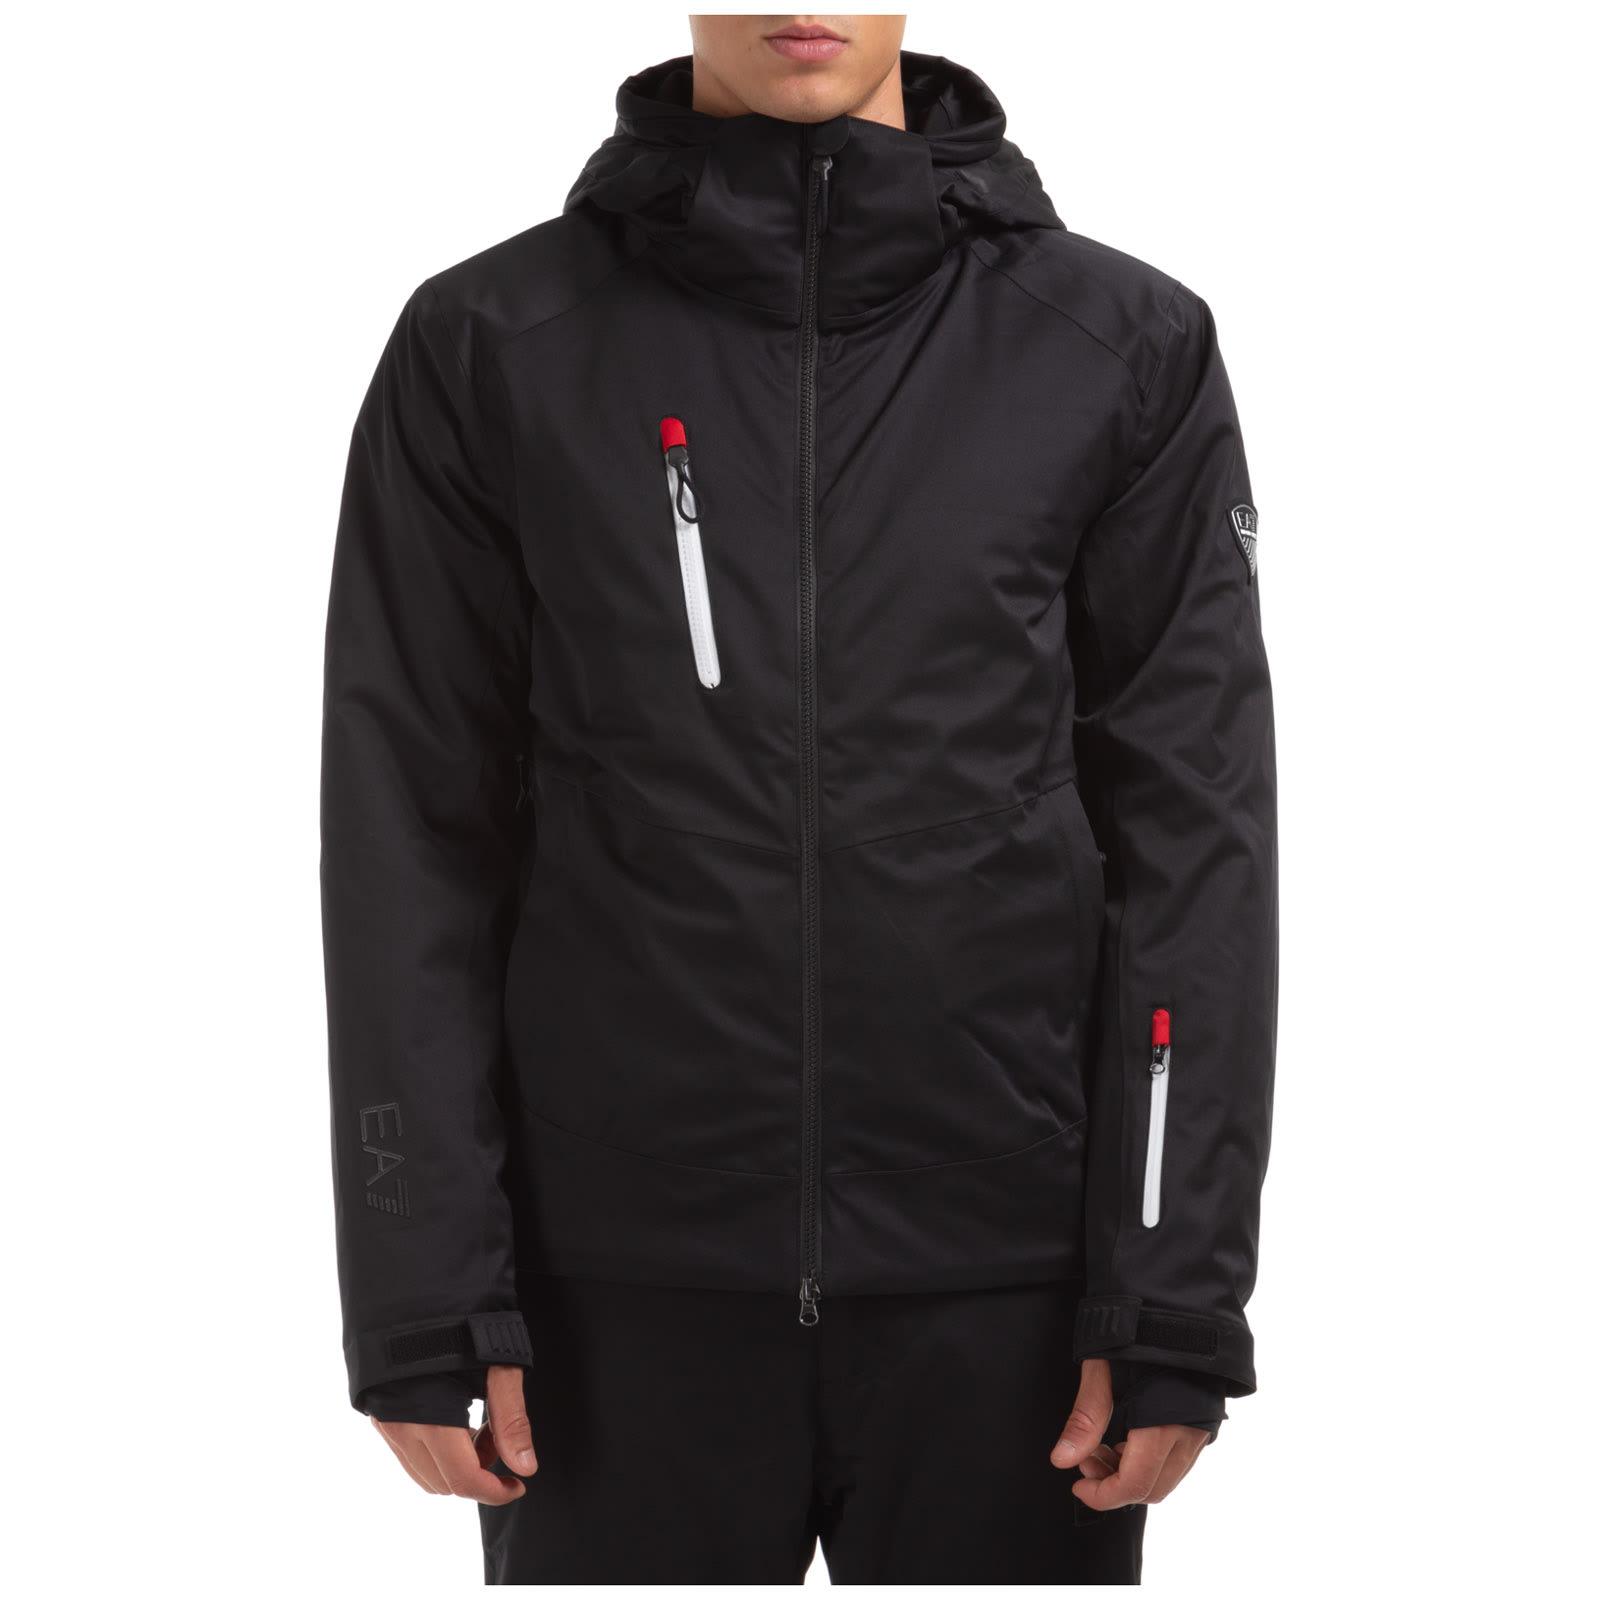 Textum 7 Ski Jackets